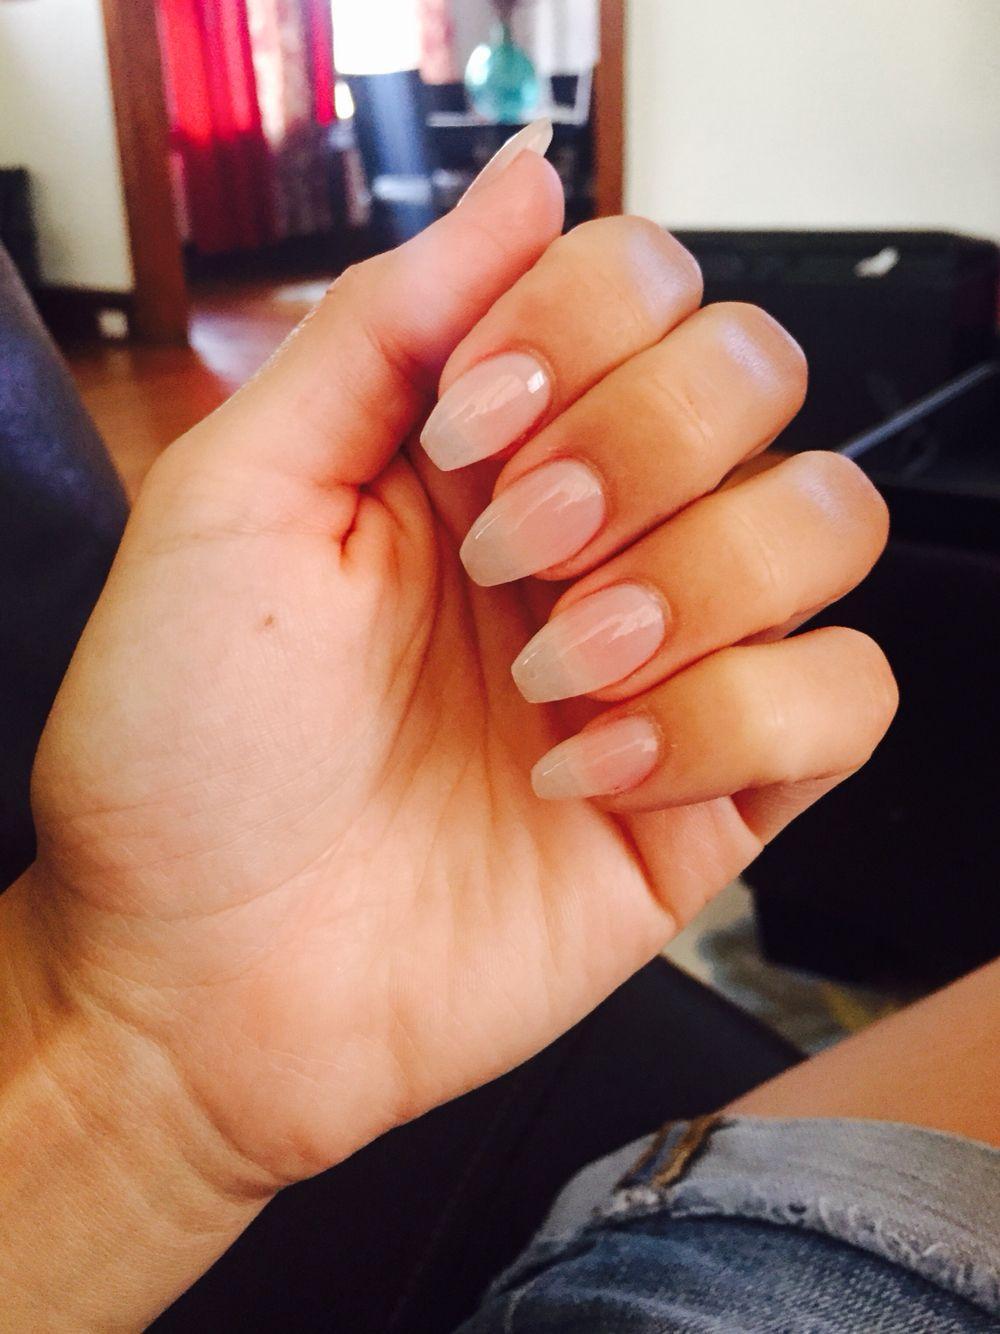 Fresh set #Coffin nails #Essie natural color | nails | Pinterest ...